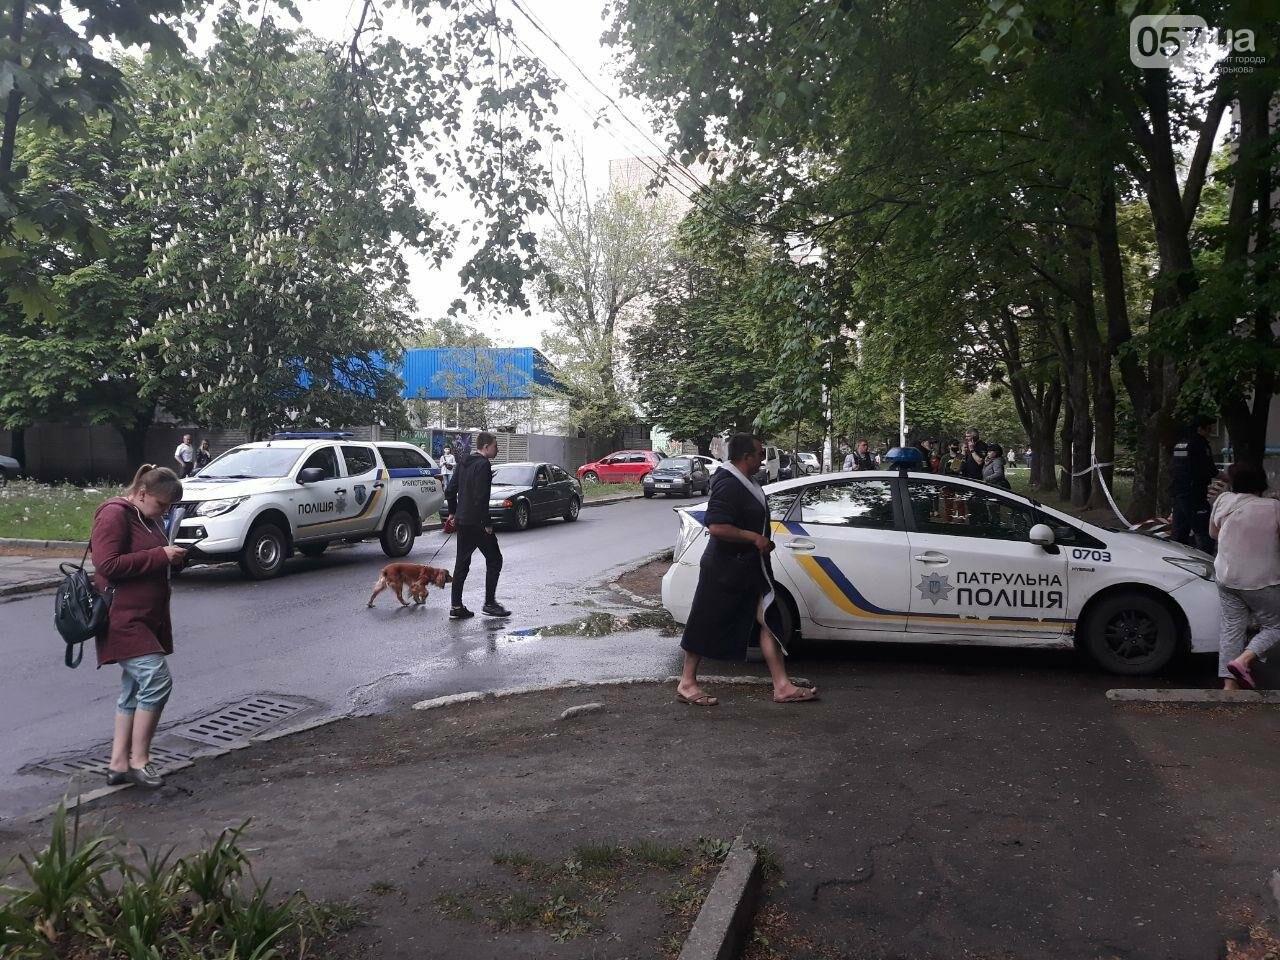 В Харькове силовики оцепили «пятиэтажку» и искали взрывчатку, - ФОТО, фото-3